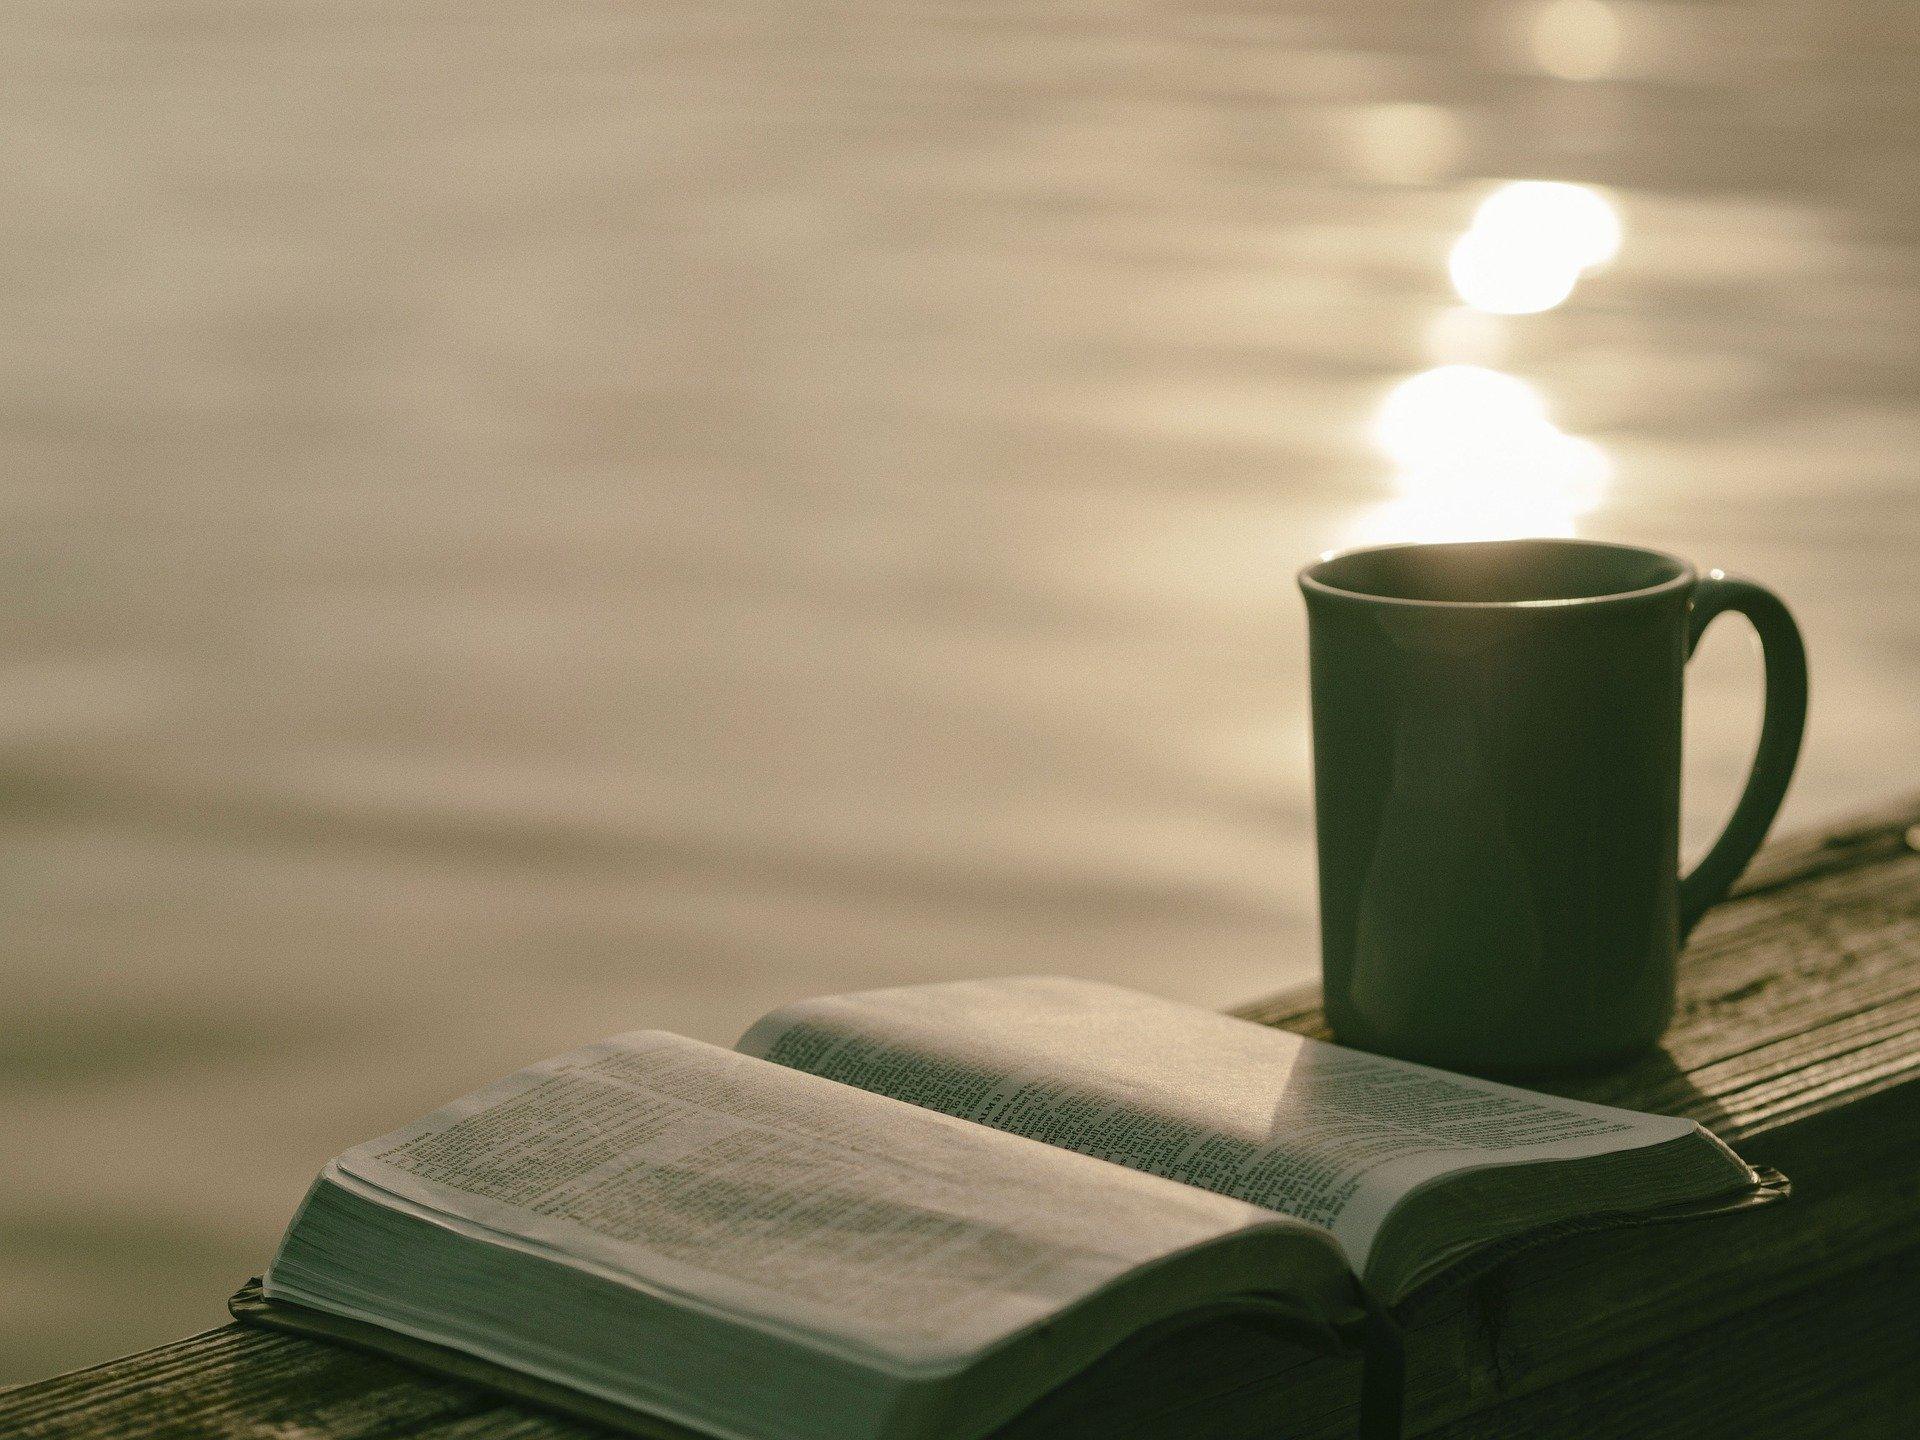 Livre et pose café